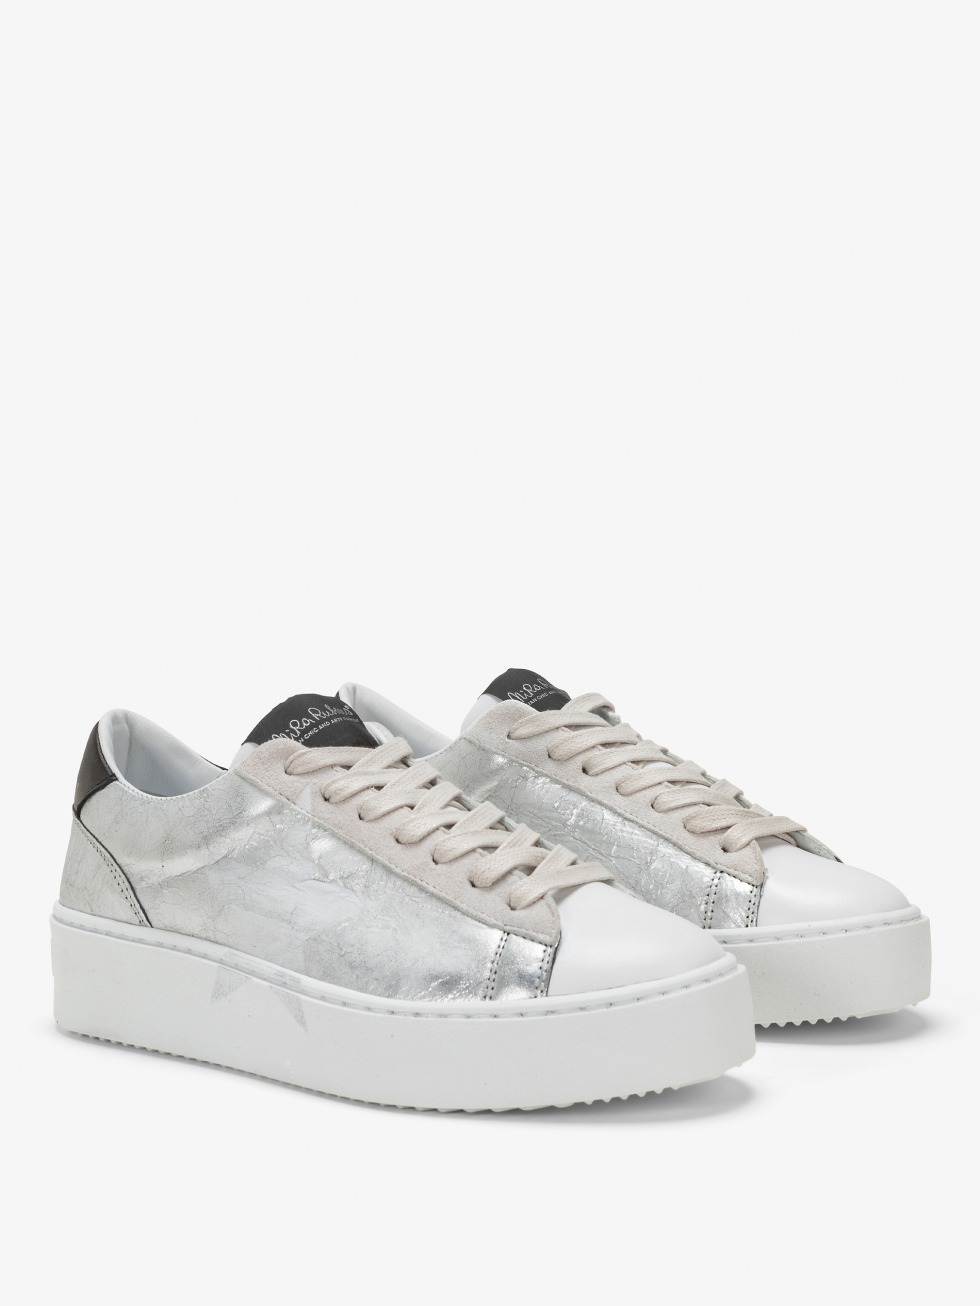 Cosmopolitan Sneakers Siderale White - Star